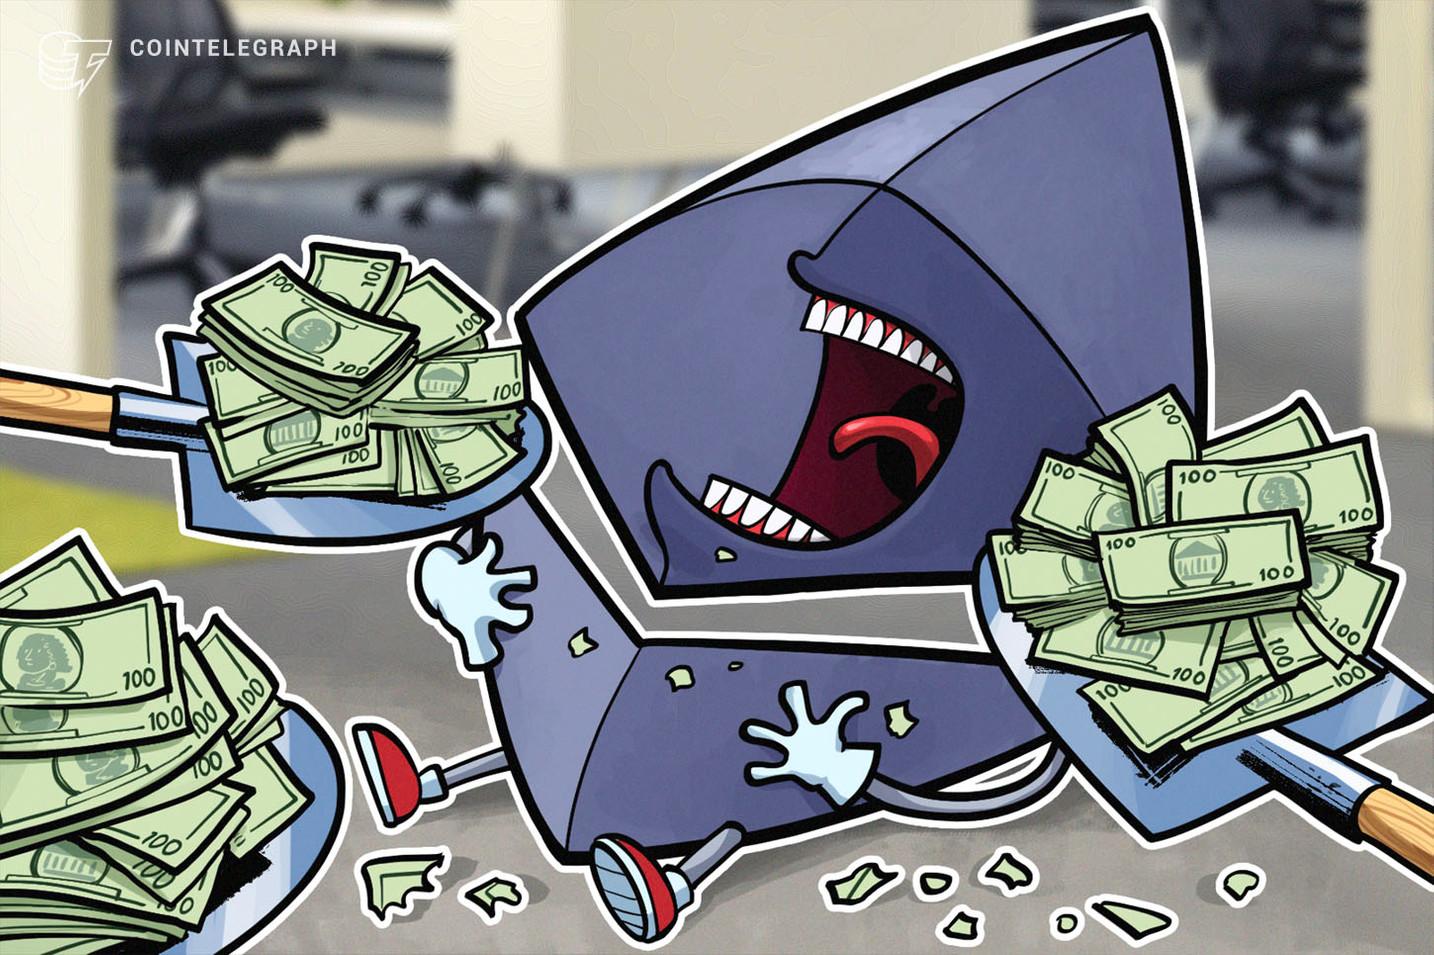 ICOが売却した仮想通貨イーサリアム 過去10日間で16万ETH